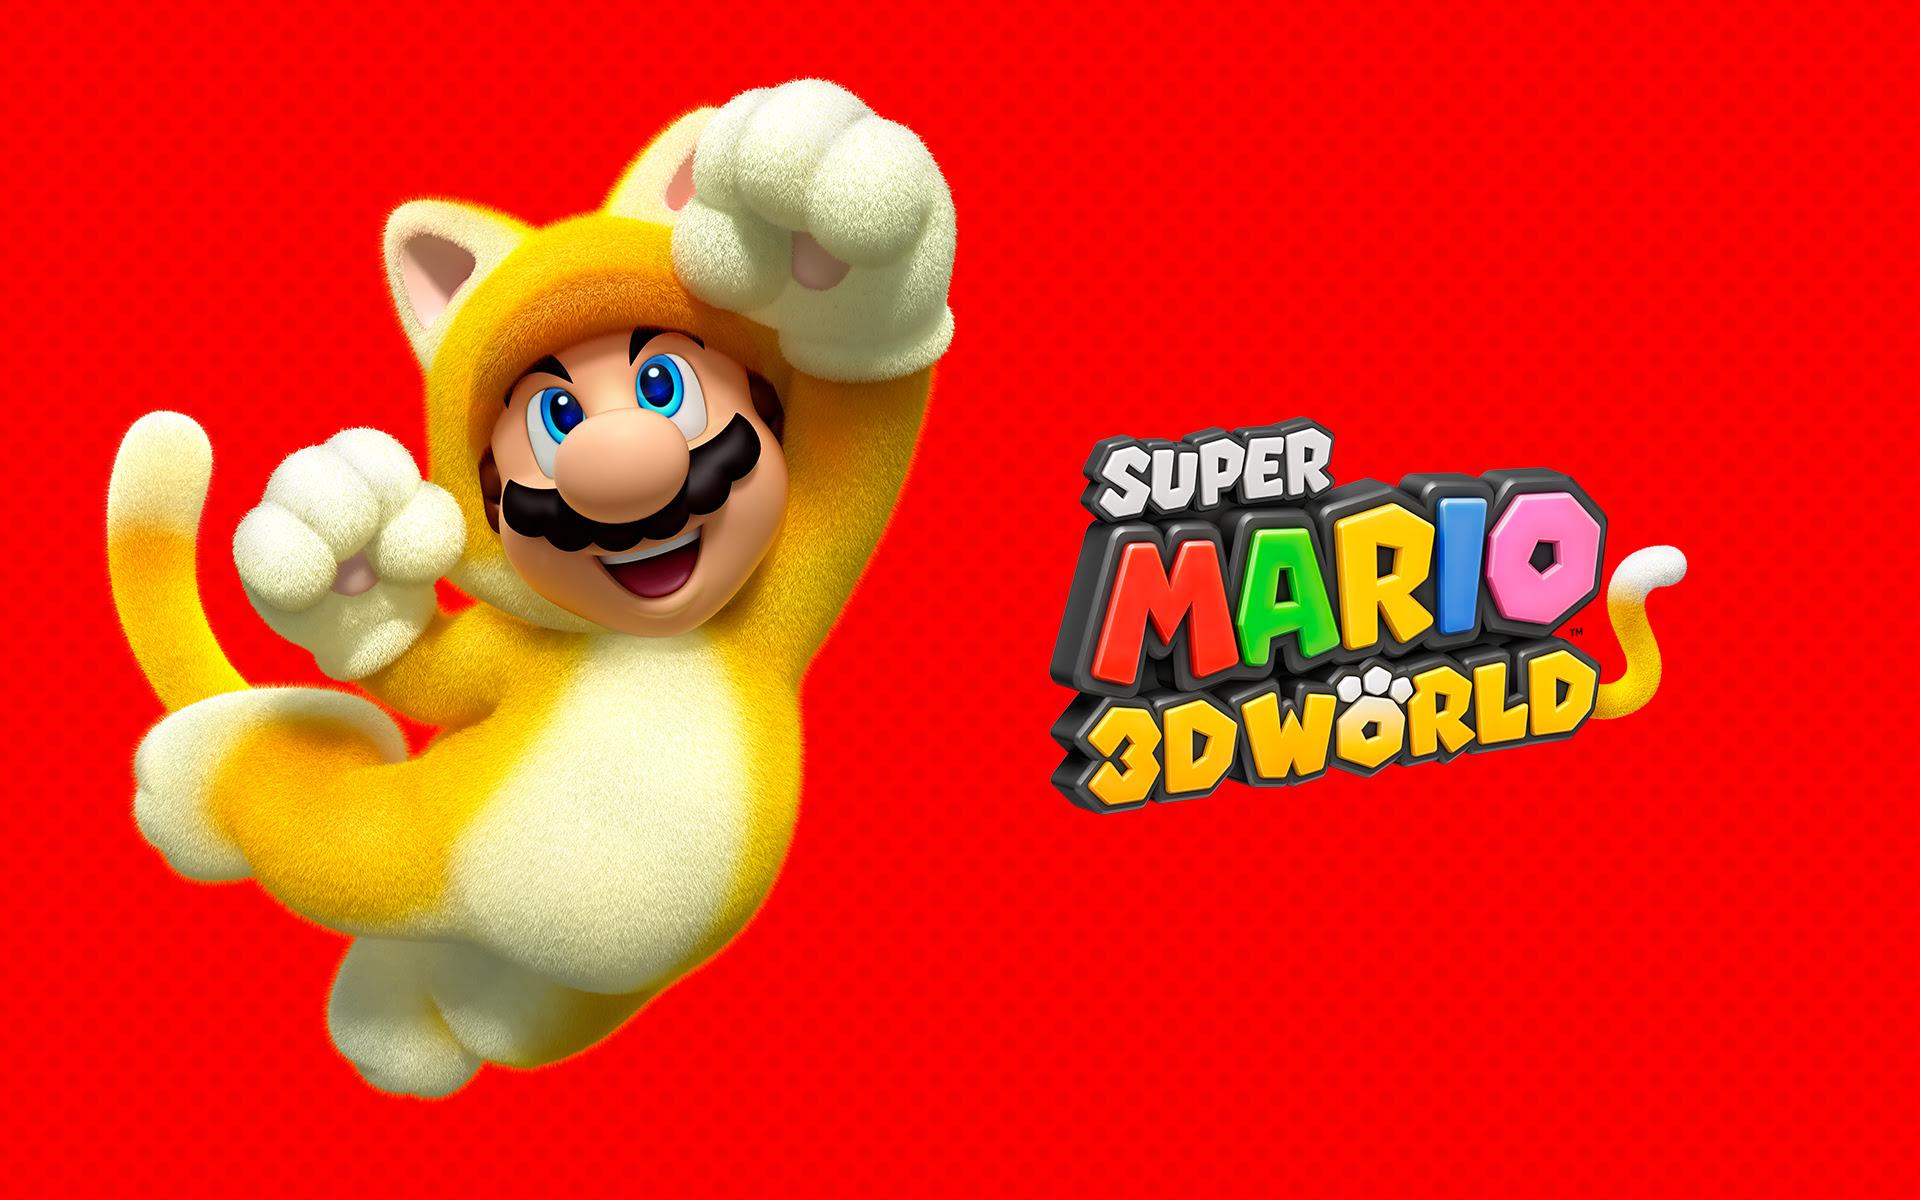 Super Mario 3d World Nintendo Wallpaper 36226221 Fanpop